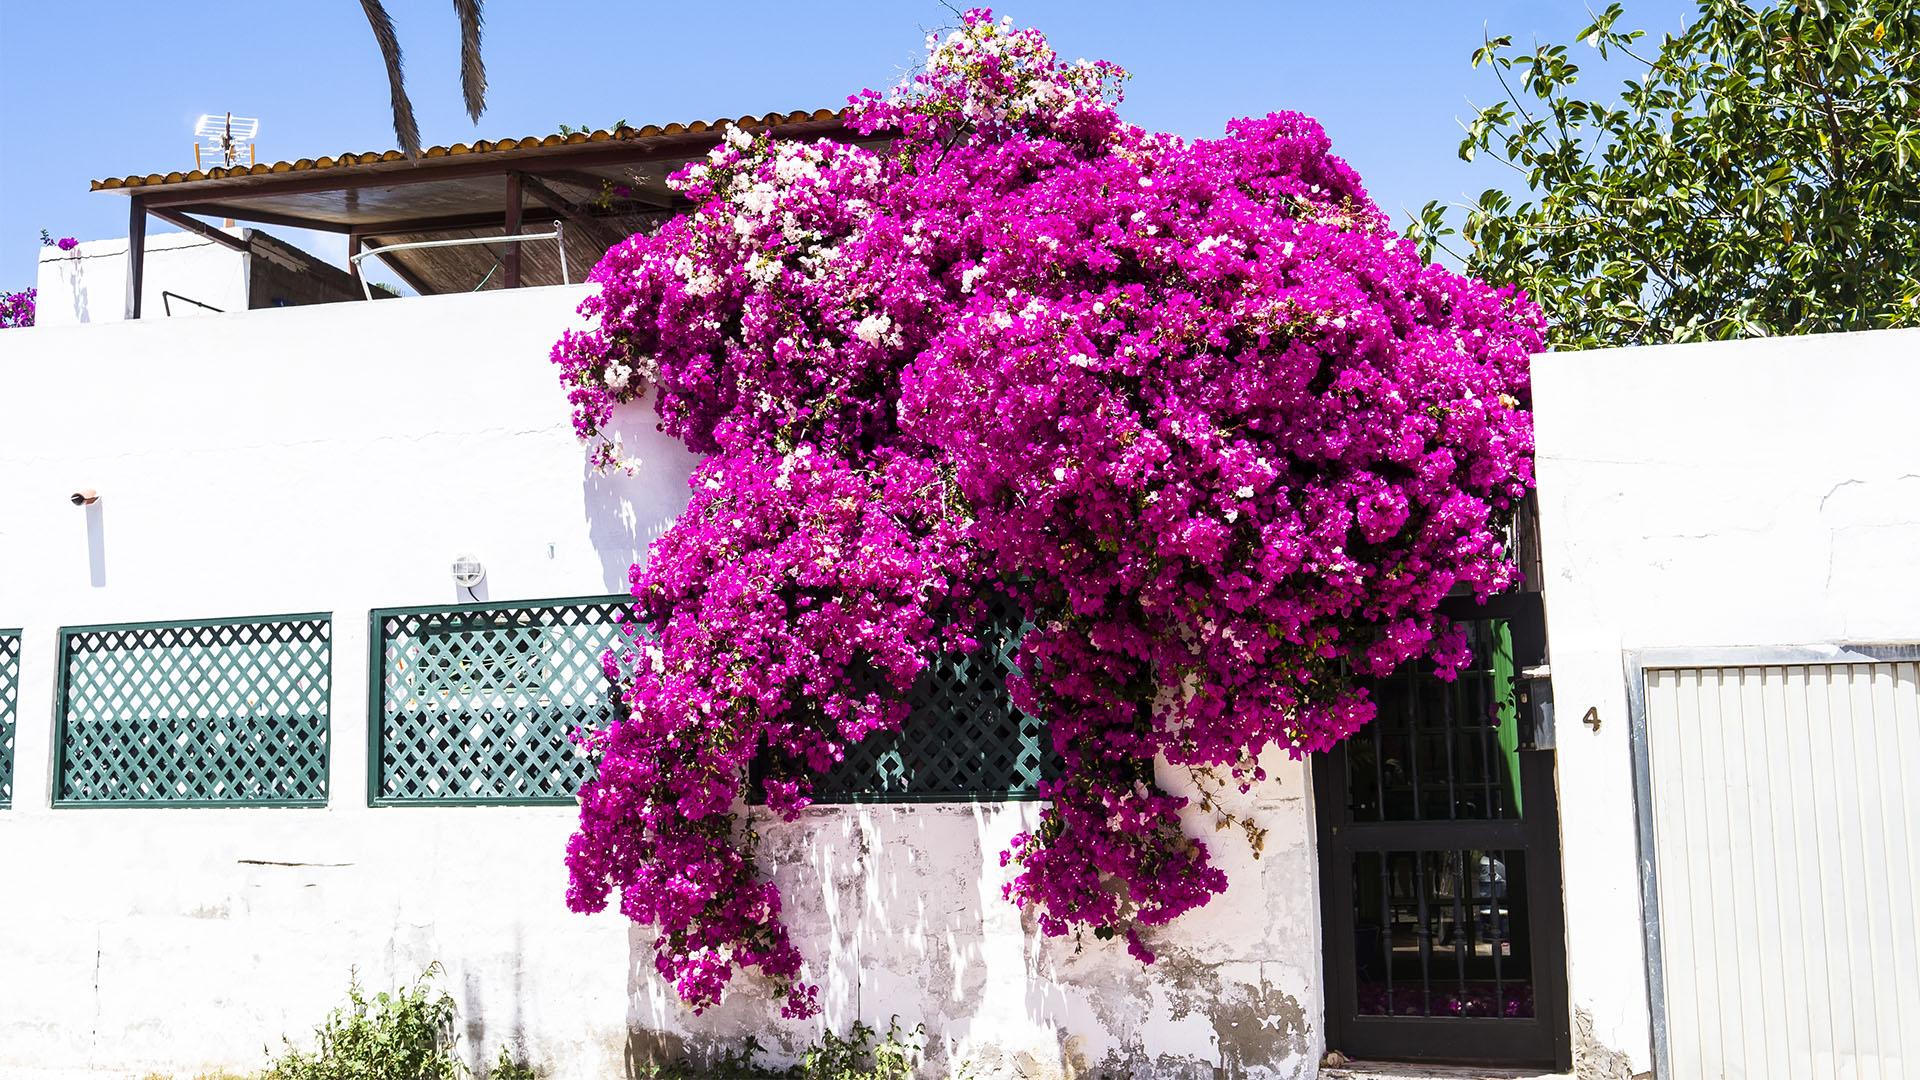 Der Ort Corralejo Fuertventura: Corralejo viejo